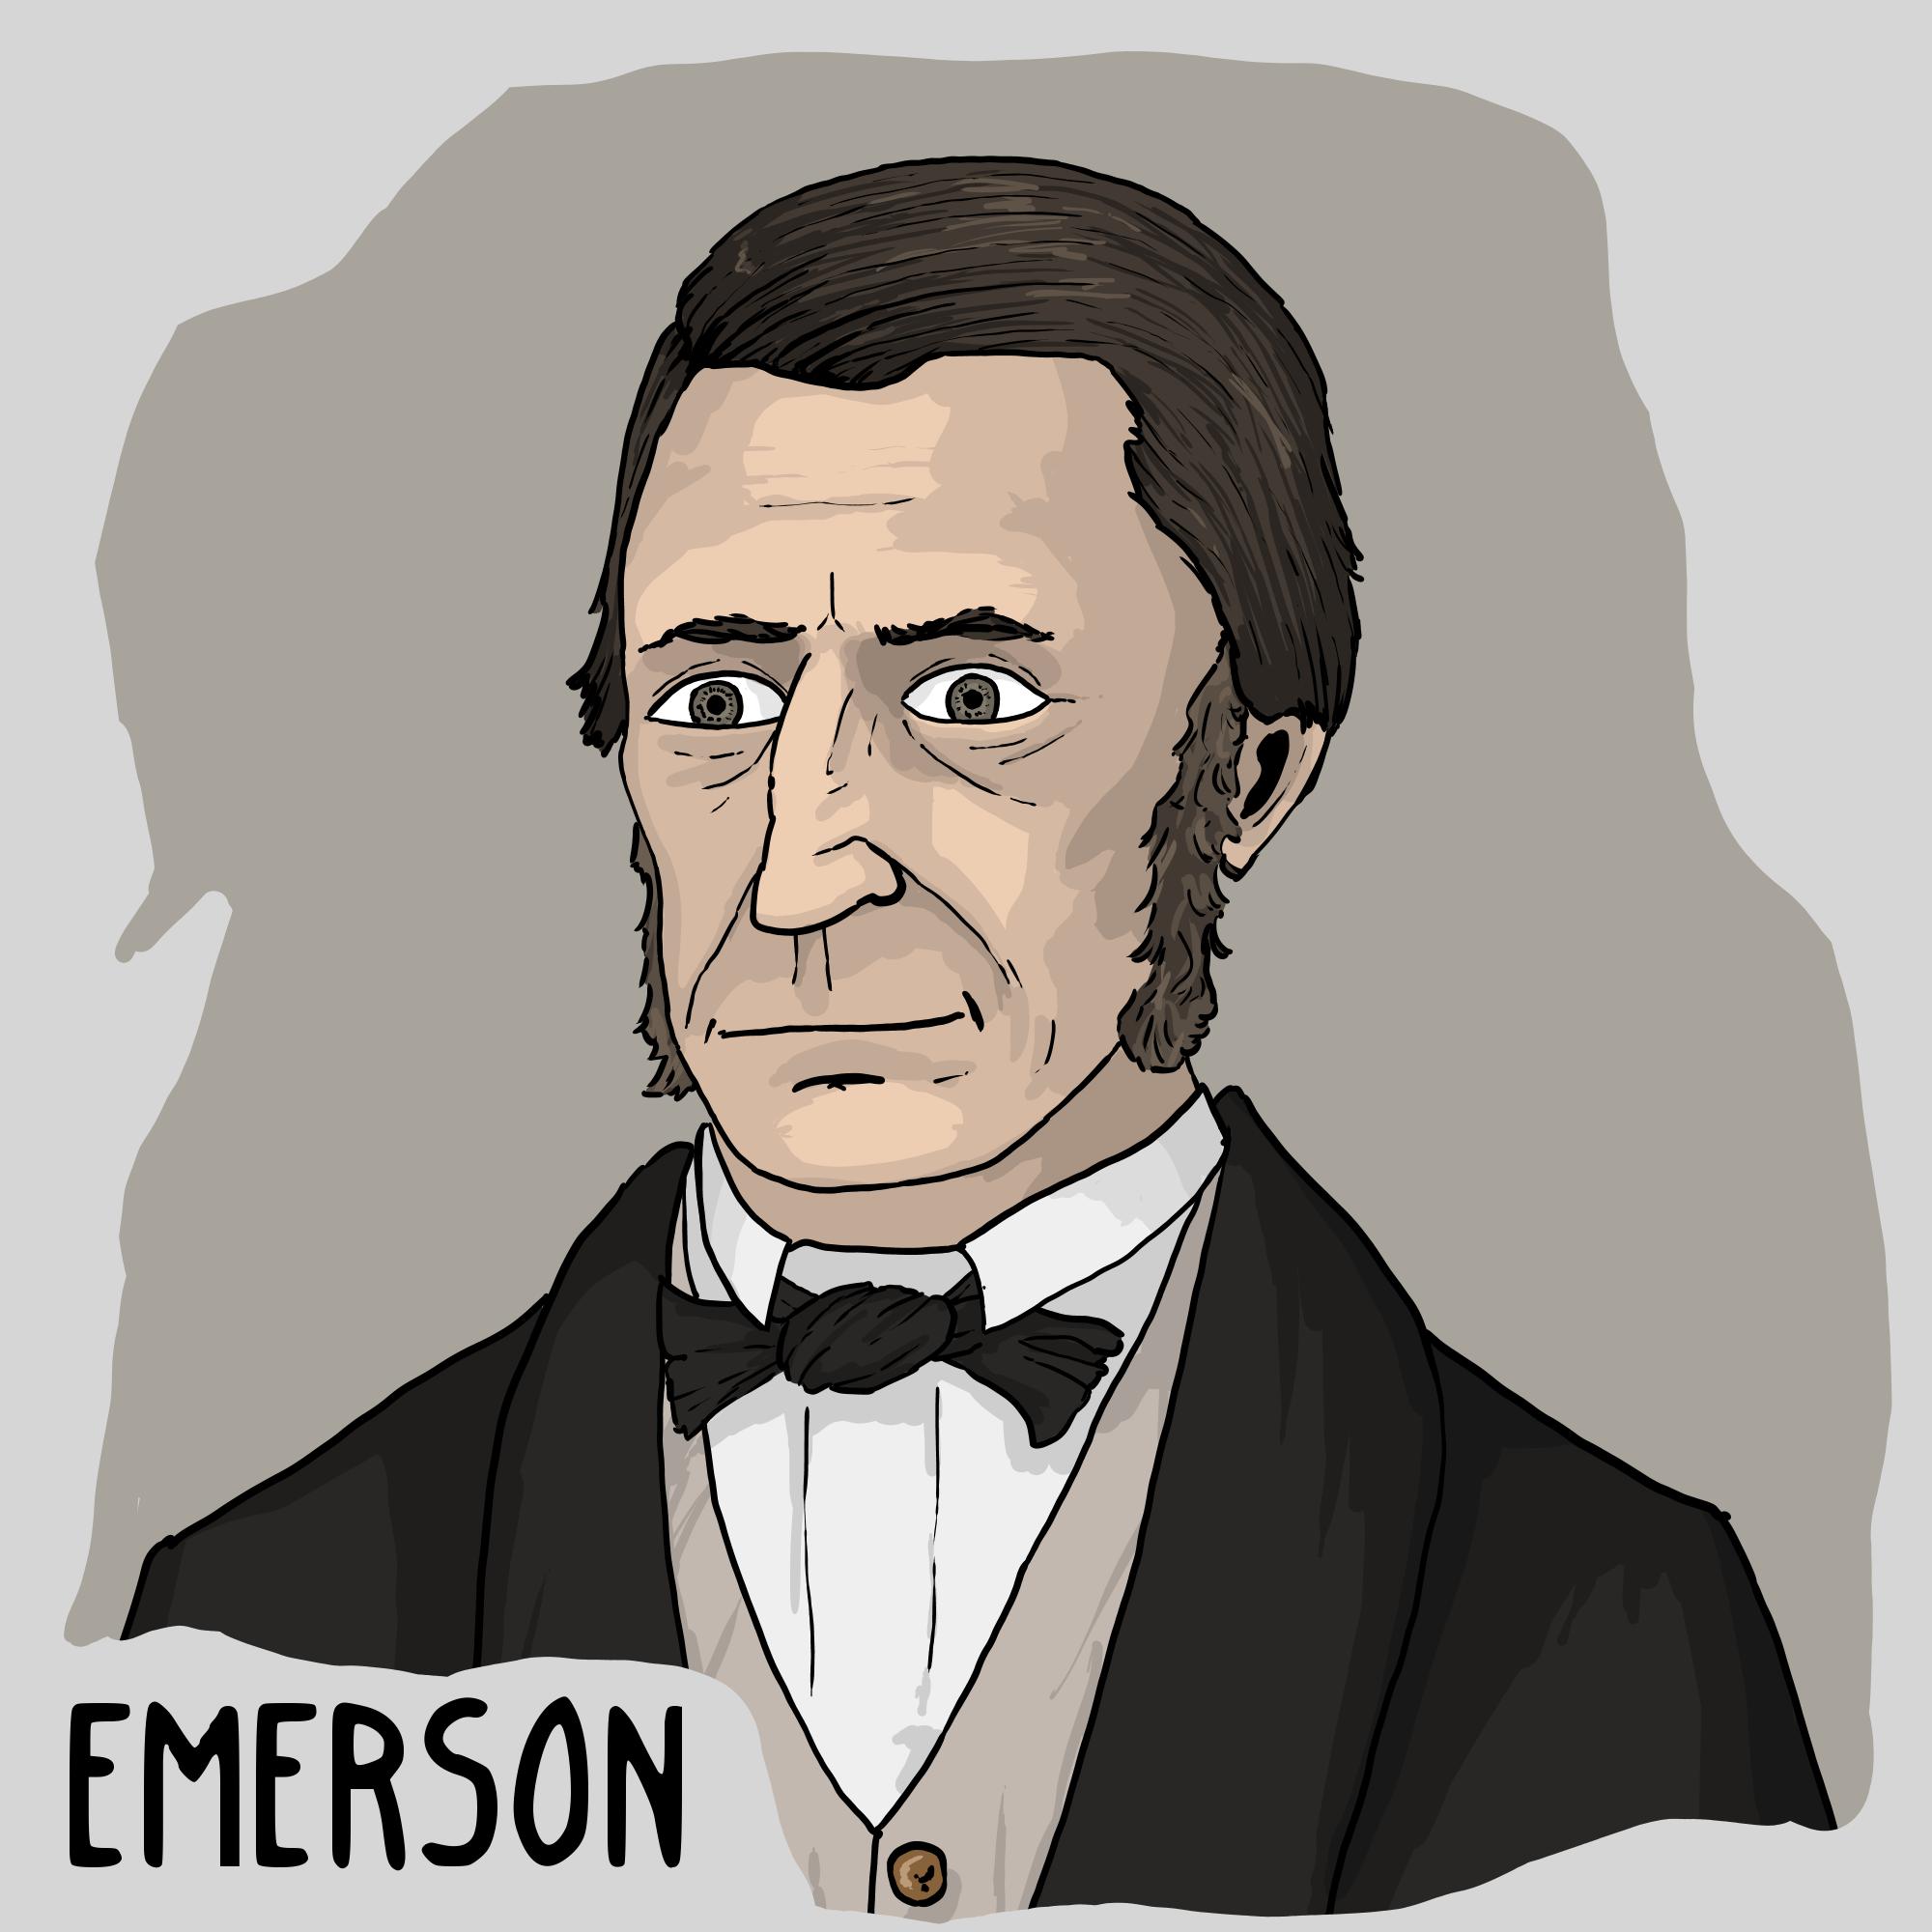 Emerson essay summaries